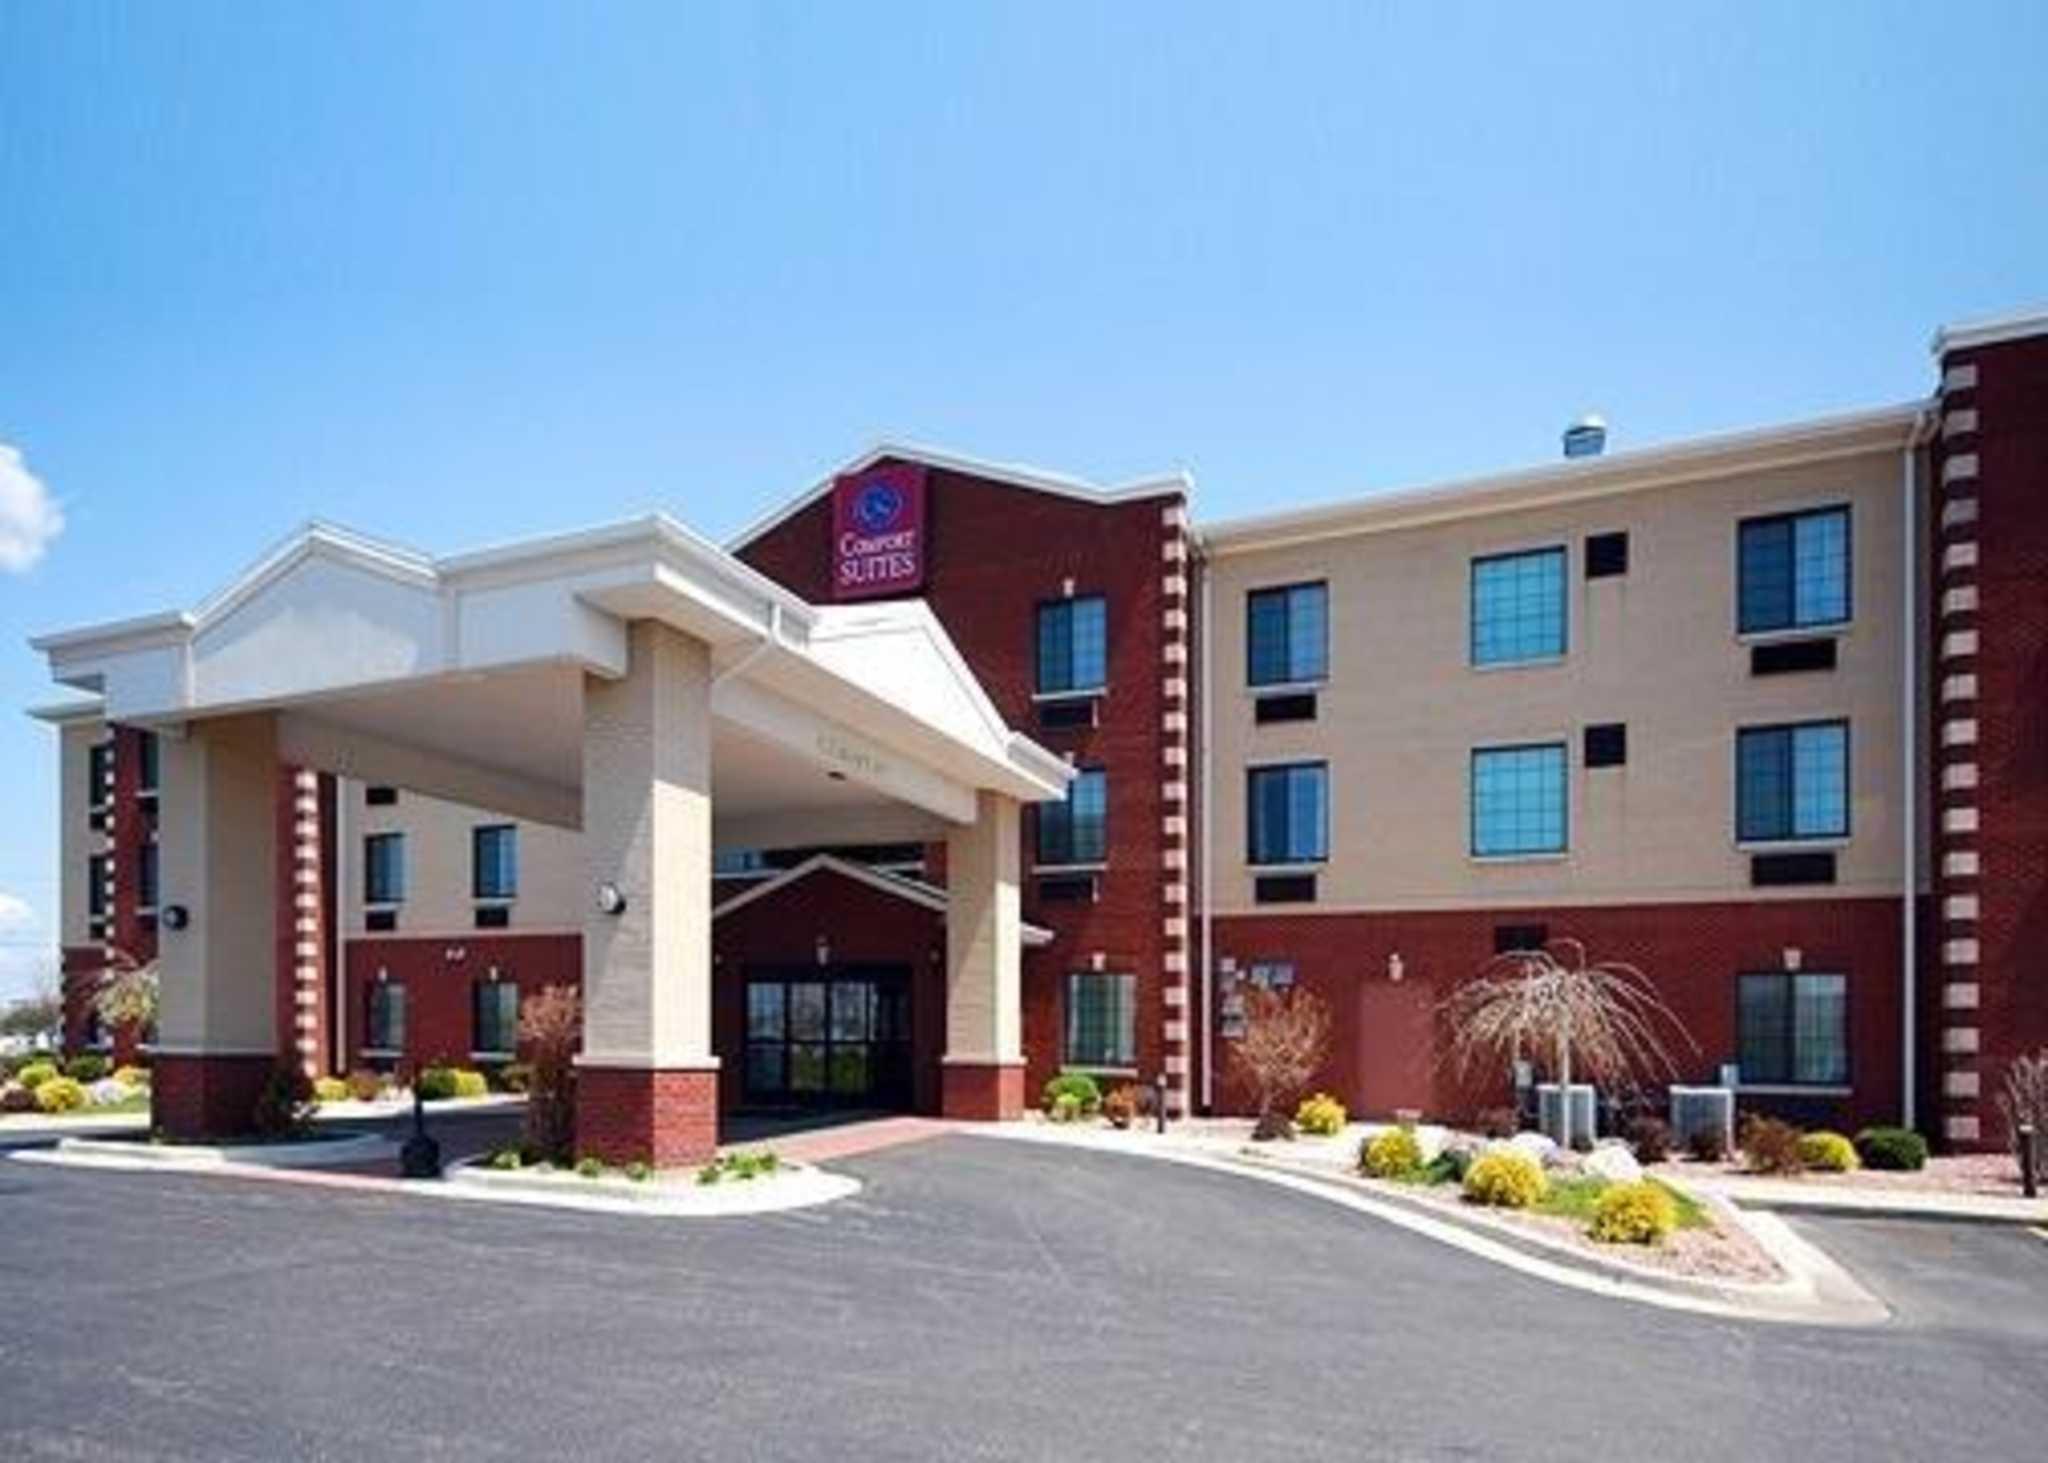 Comfort Suites South - Grand Rapids, MI 49548 - (616)301-2255 | ShowMeLocal.com